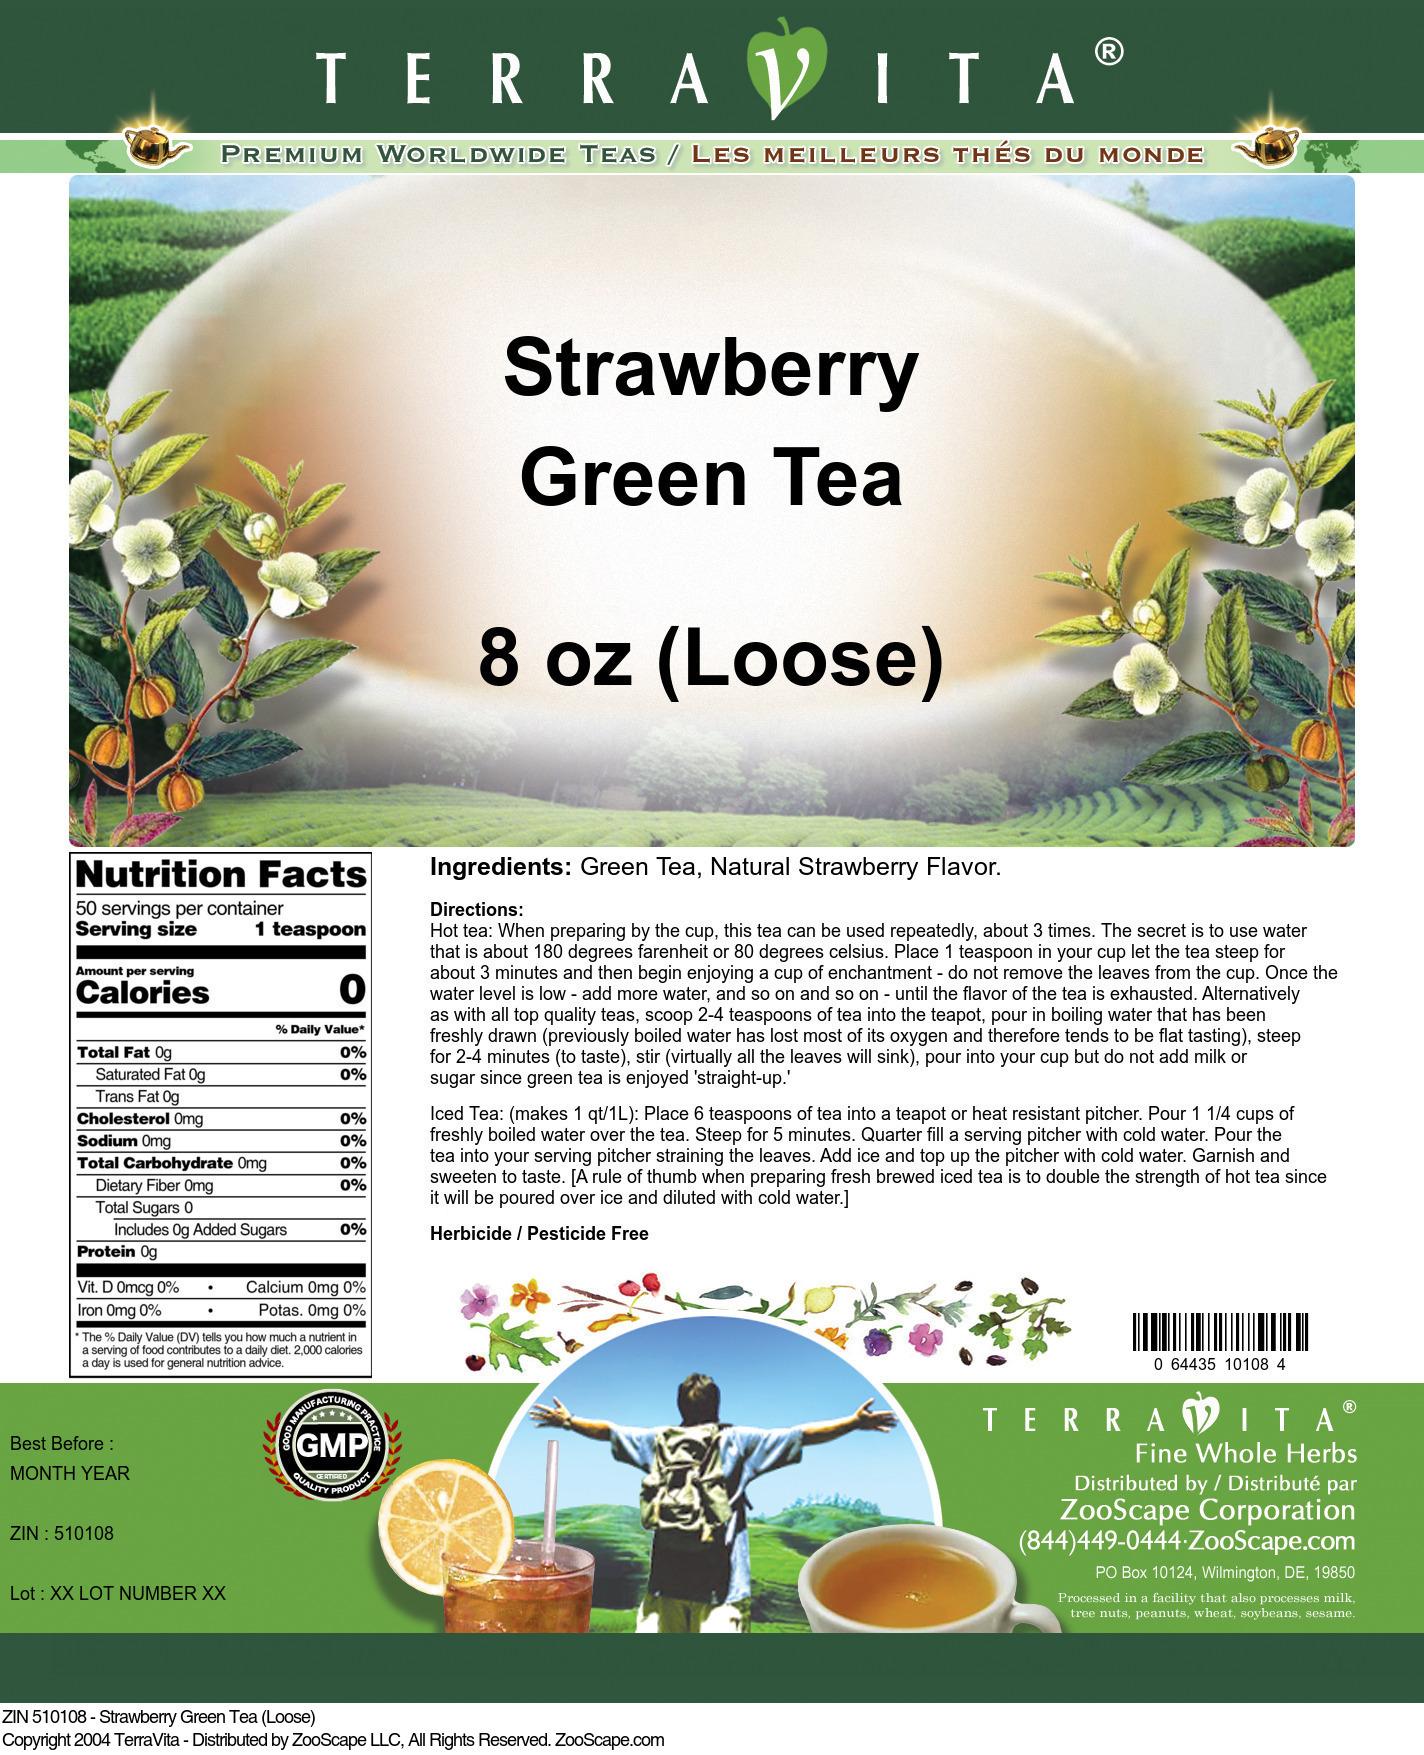 Strawberry Green Tea (Loose)